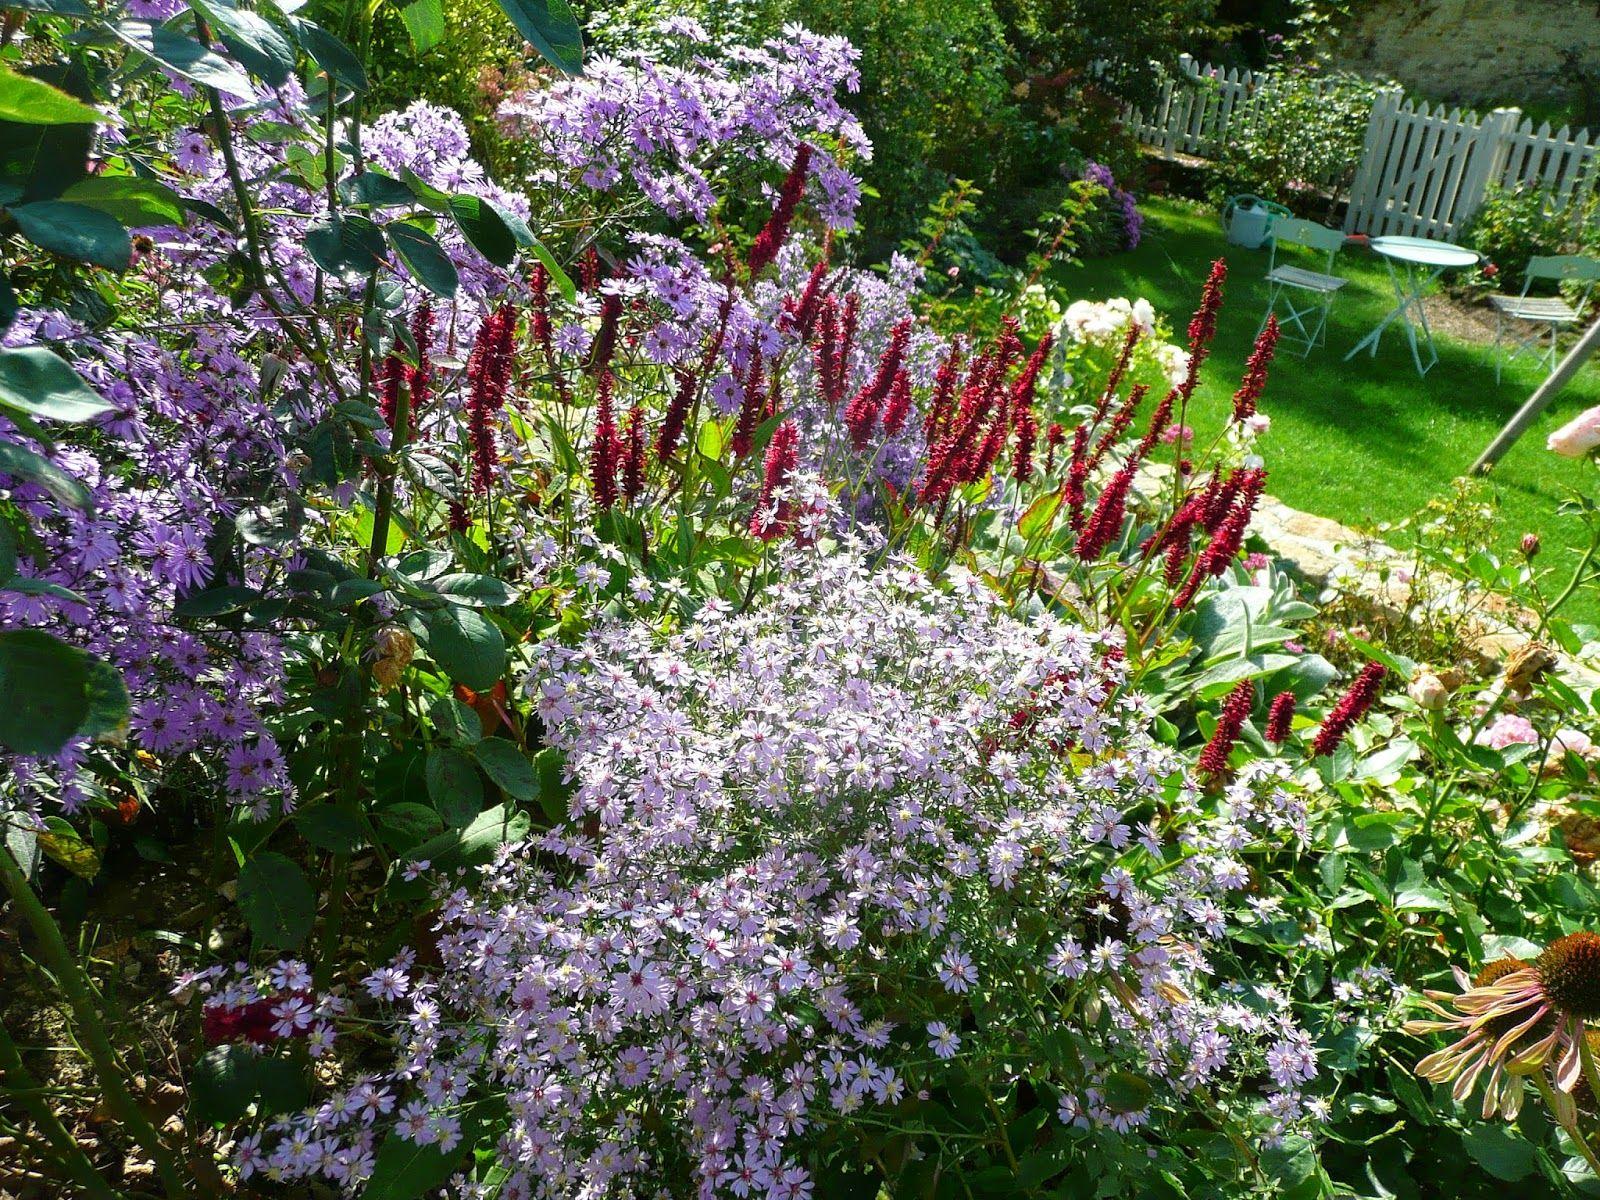 Aster little carlow ideal et persicaria blackfield